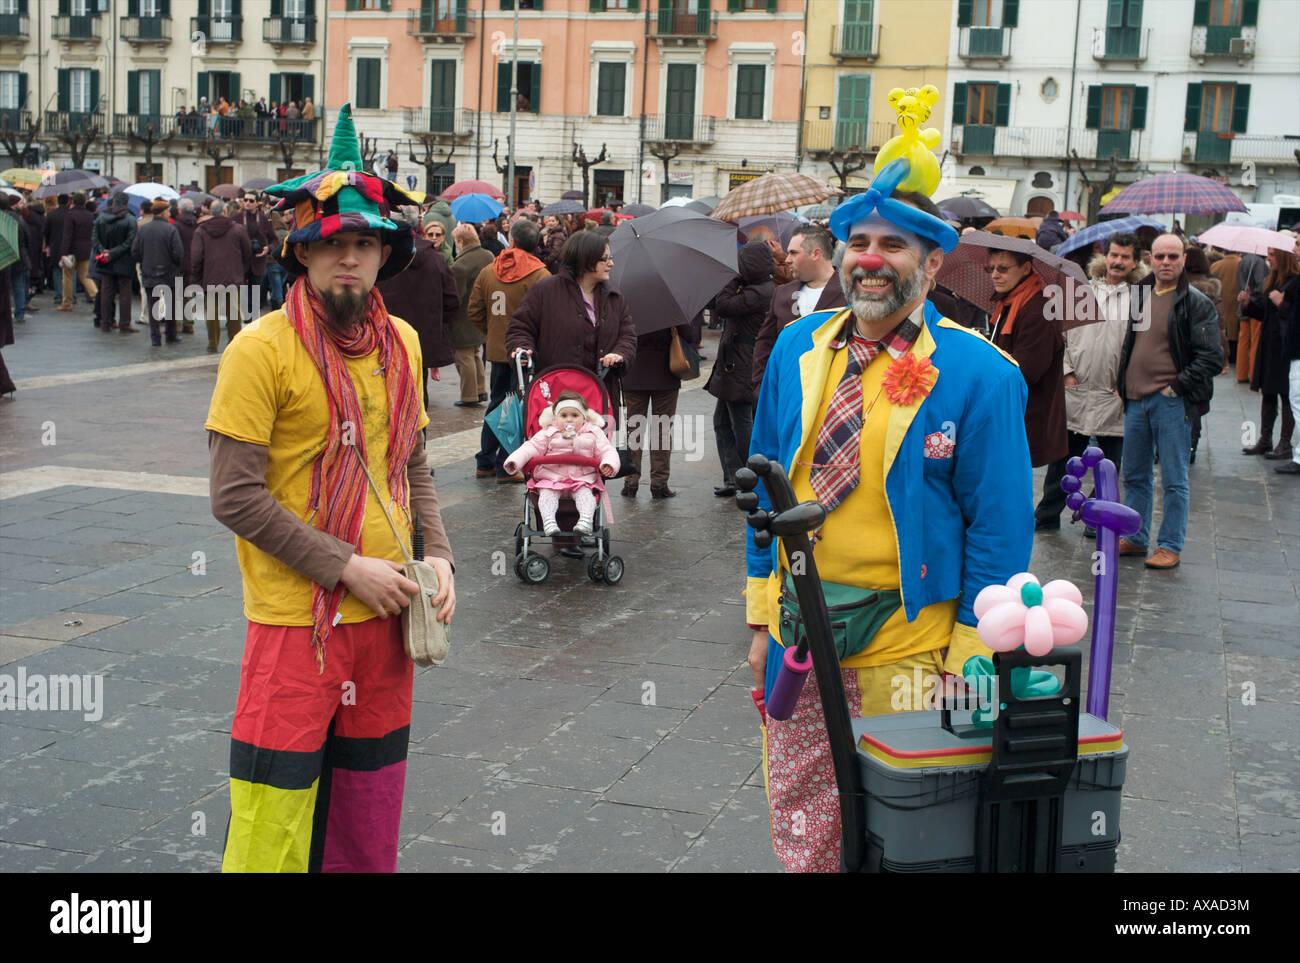 Sulmona easter in Italy - Stock Image